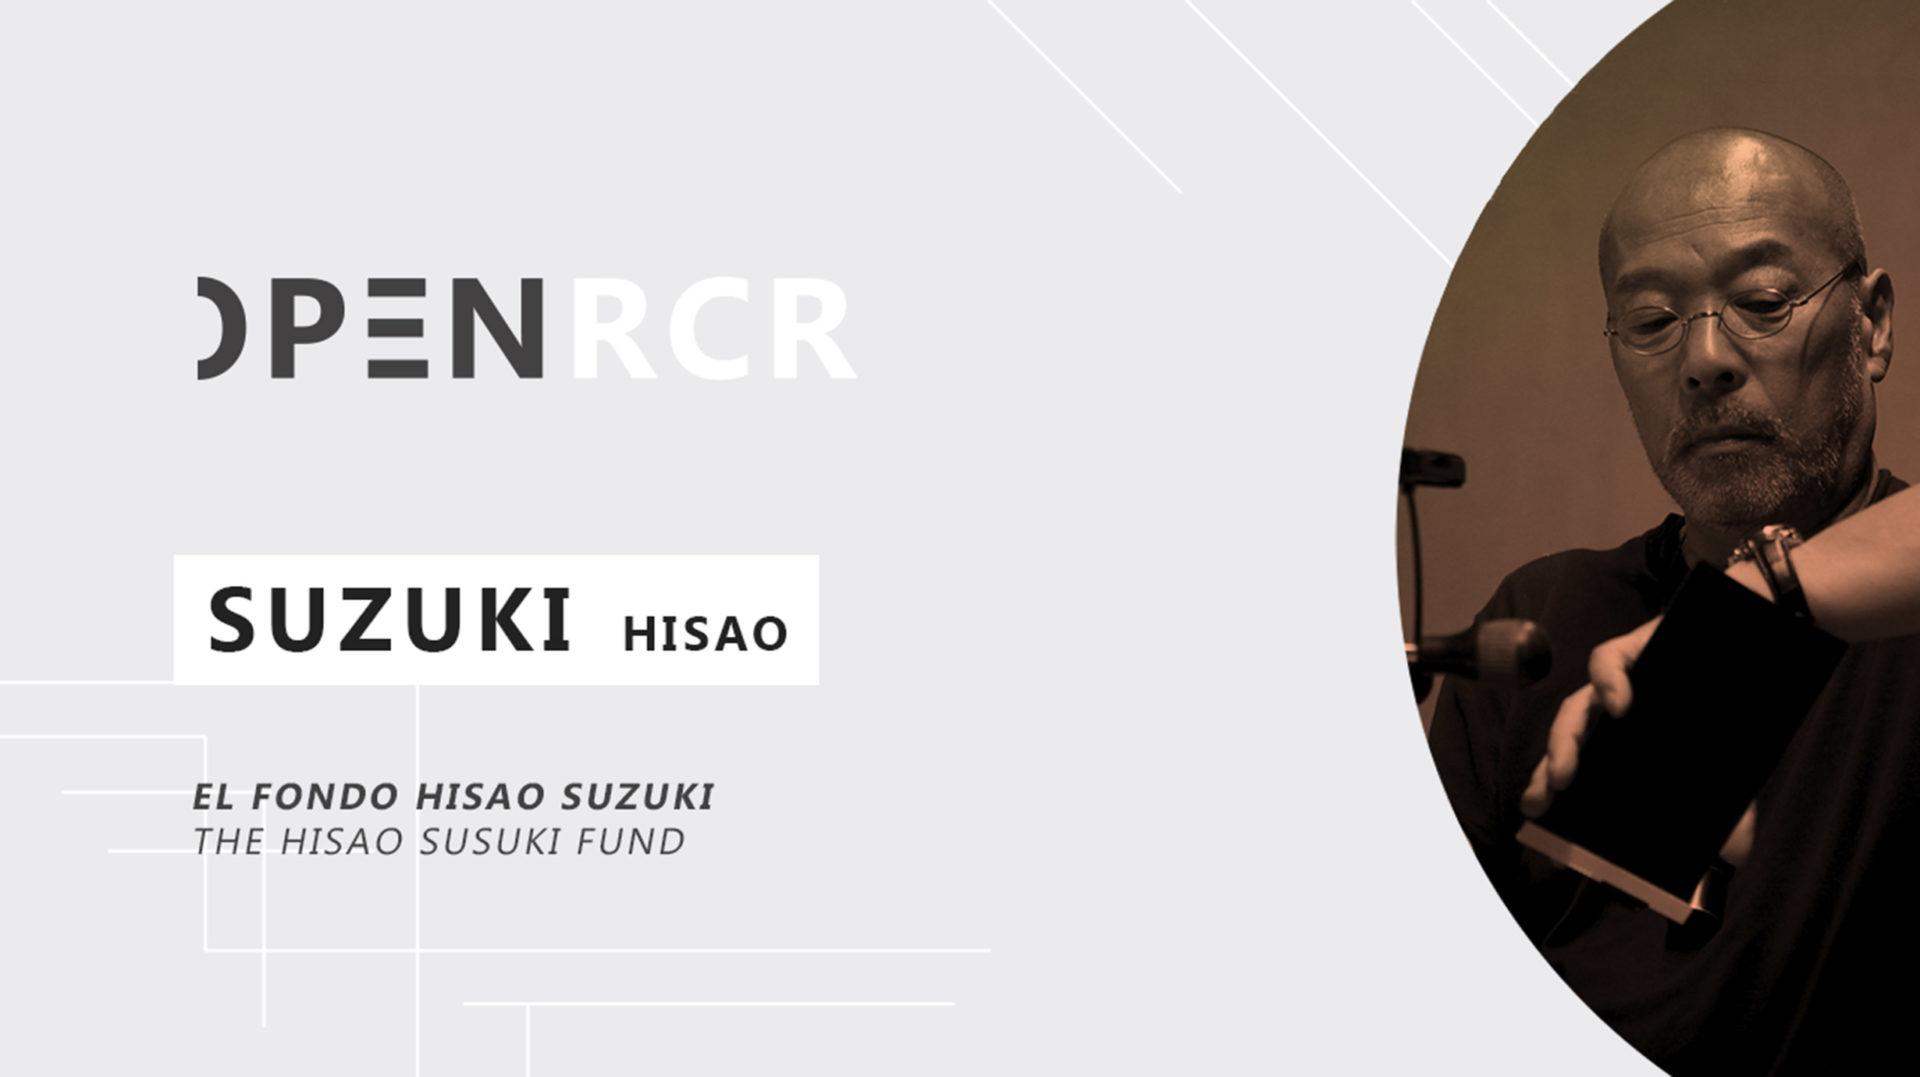 Hisao Suzuki